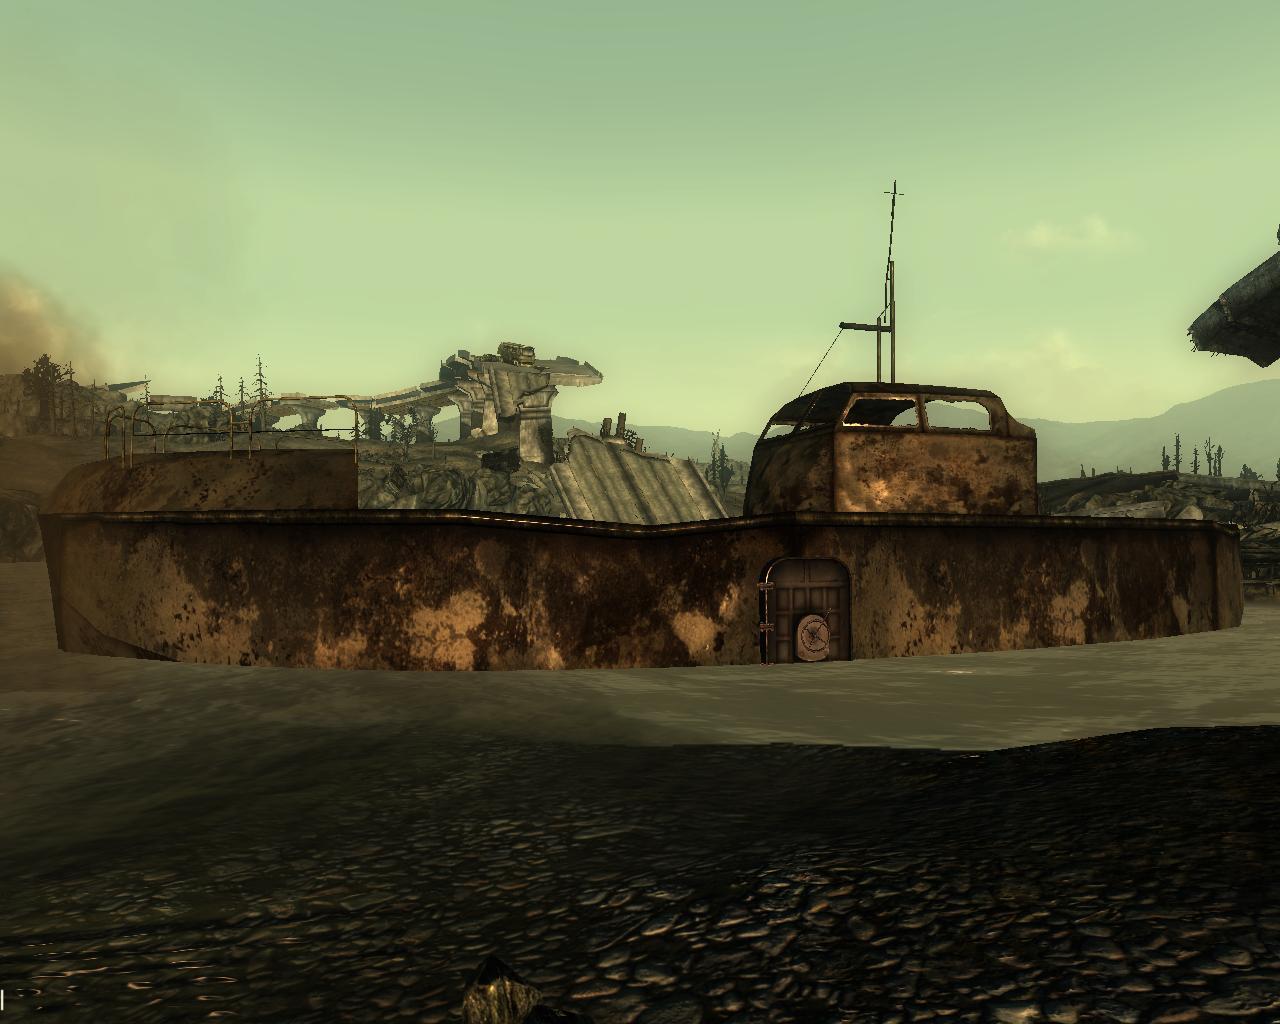 Falloutdefoxmod.ucoz.ru/ ICQ641351999 Версия 1.0 Требования Fallout